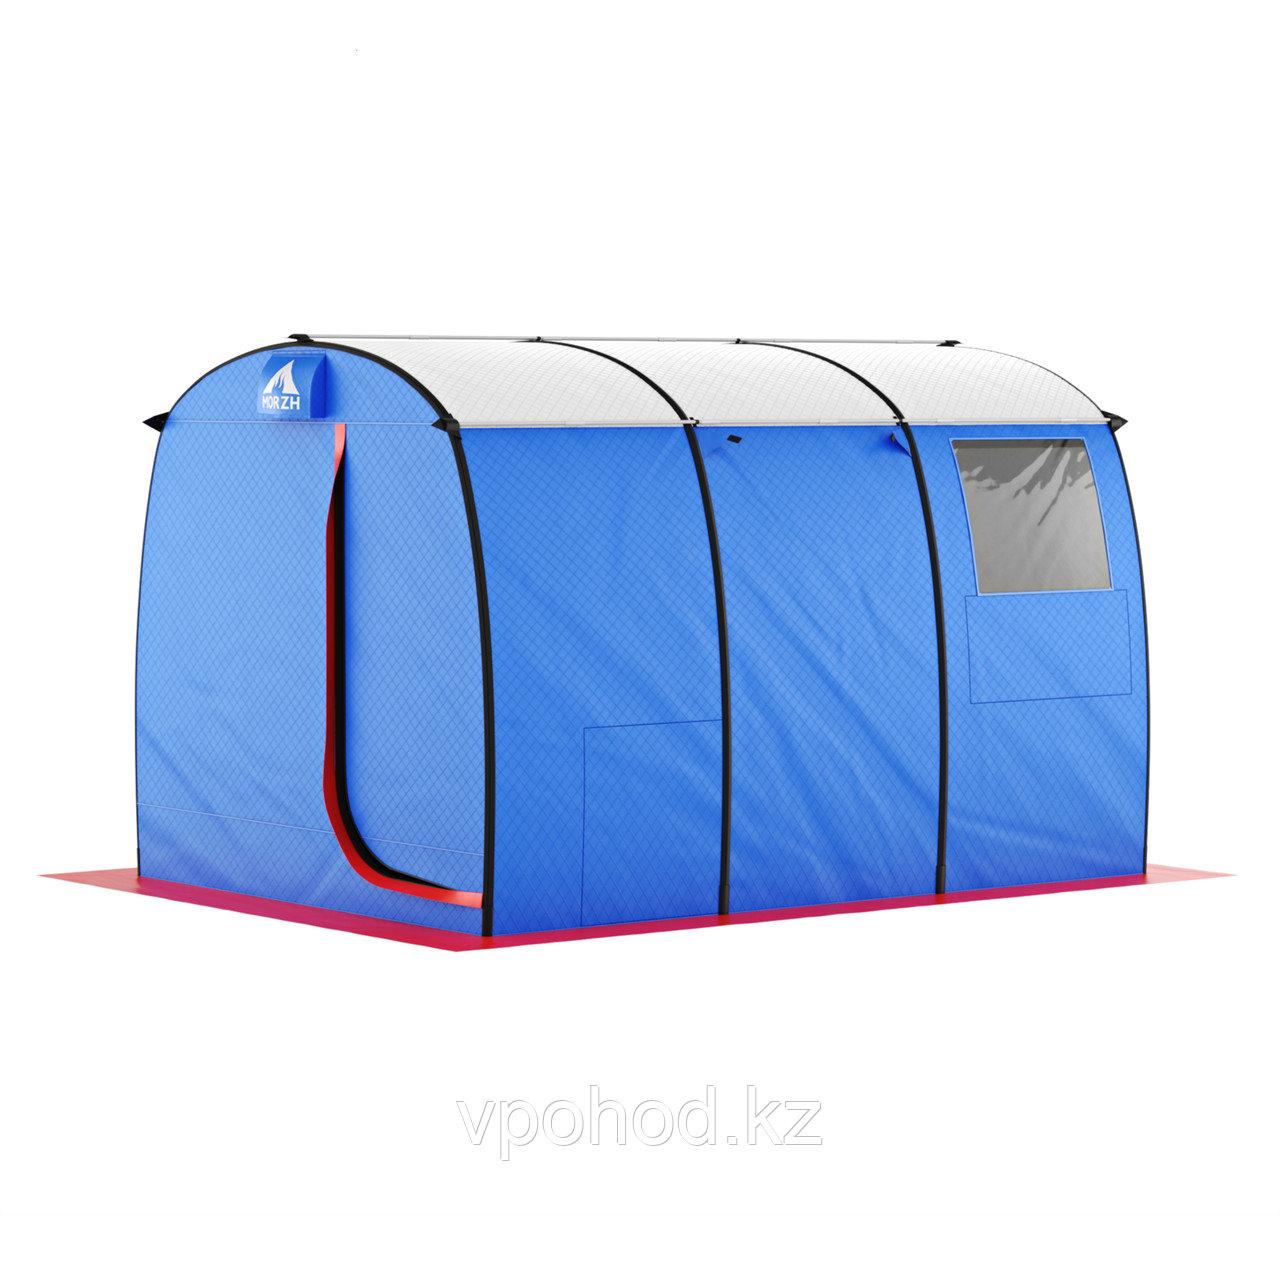 "Мобильная баня/палатка ""Морж"""